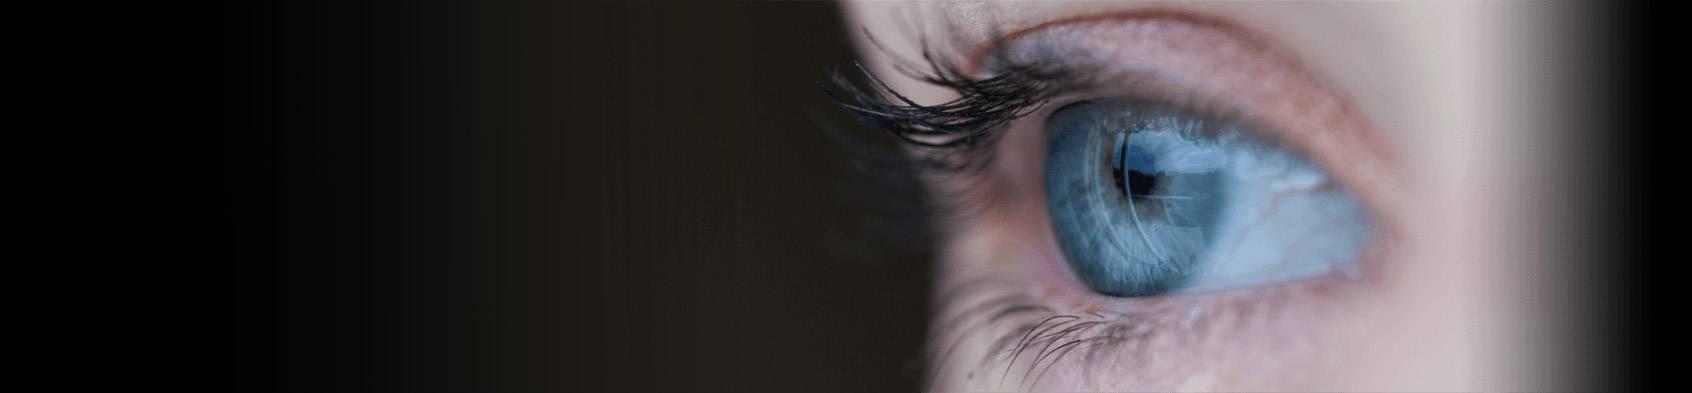 dry eye close up